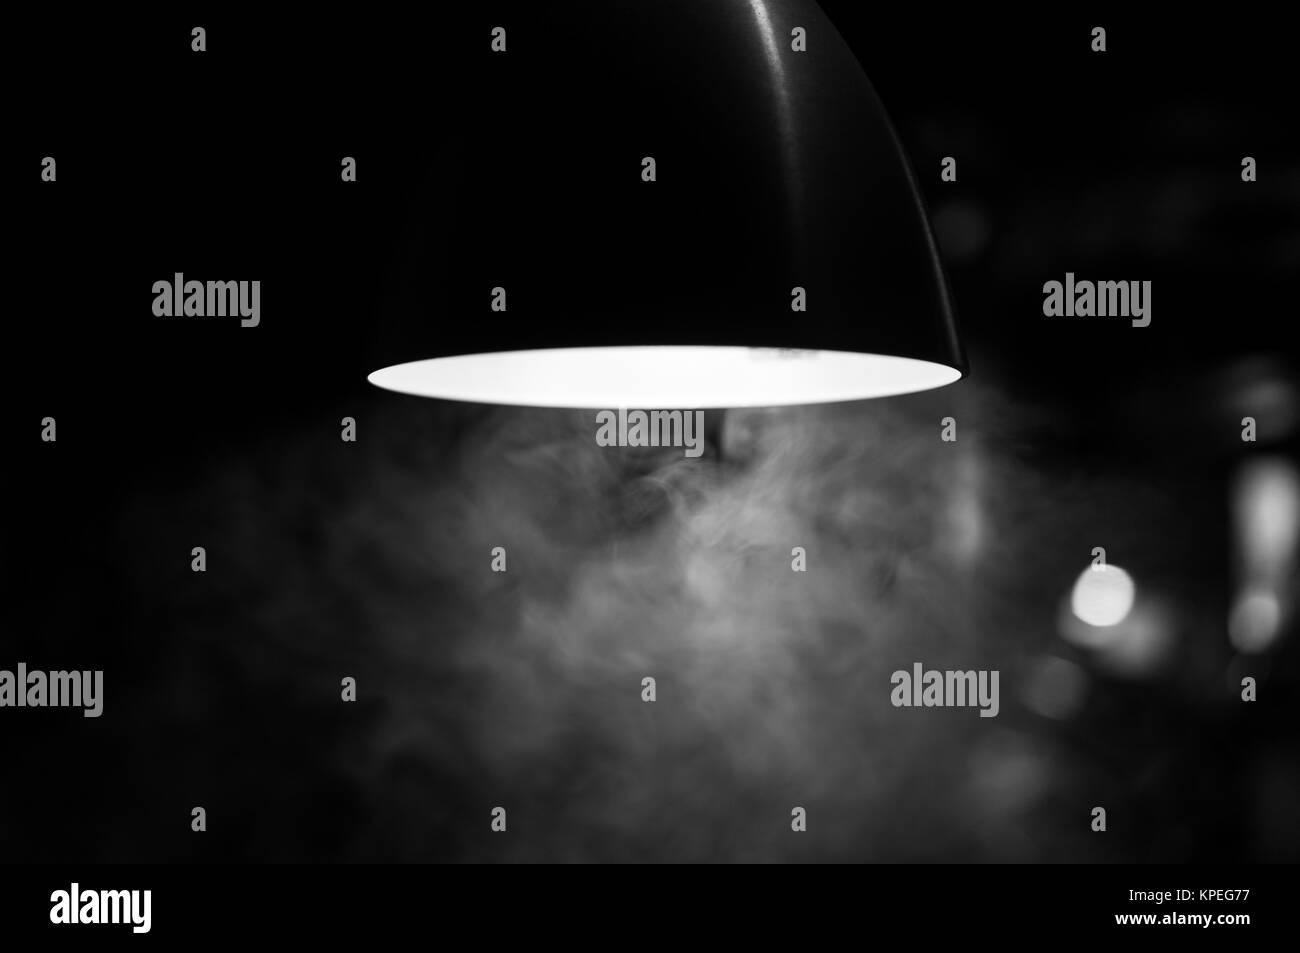 Smoke under the light - Stock Image